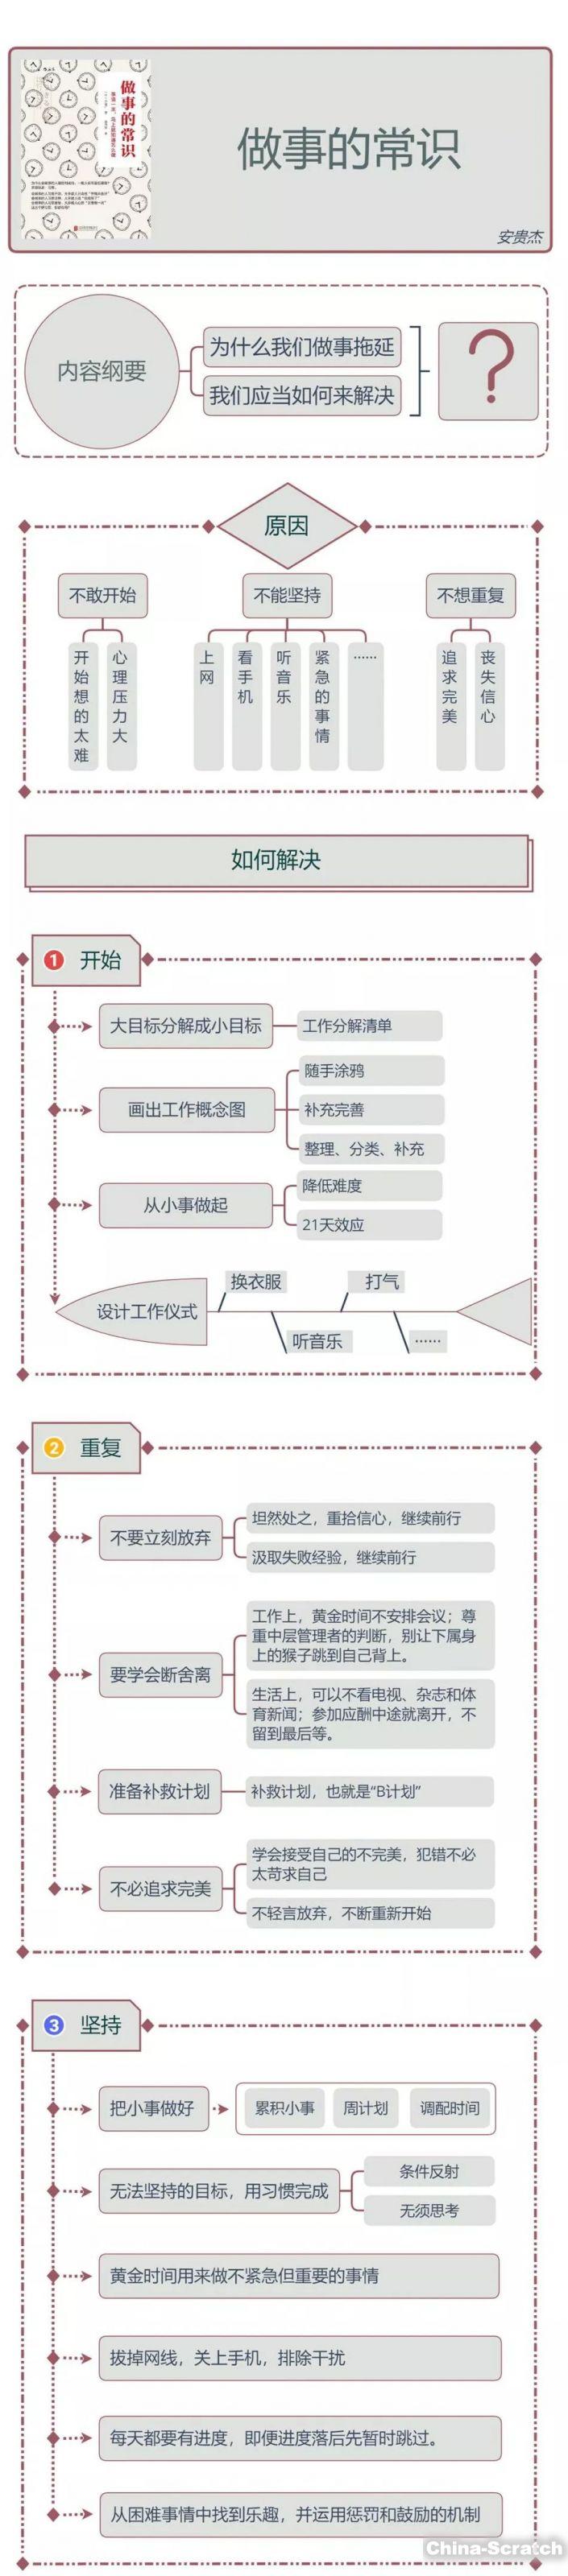 https://cdn.china-scratch.com/timg/191022/145K44526-15.jpg